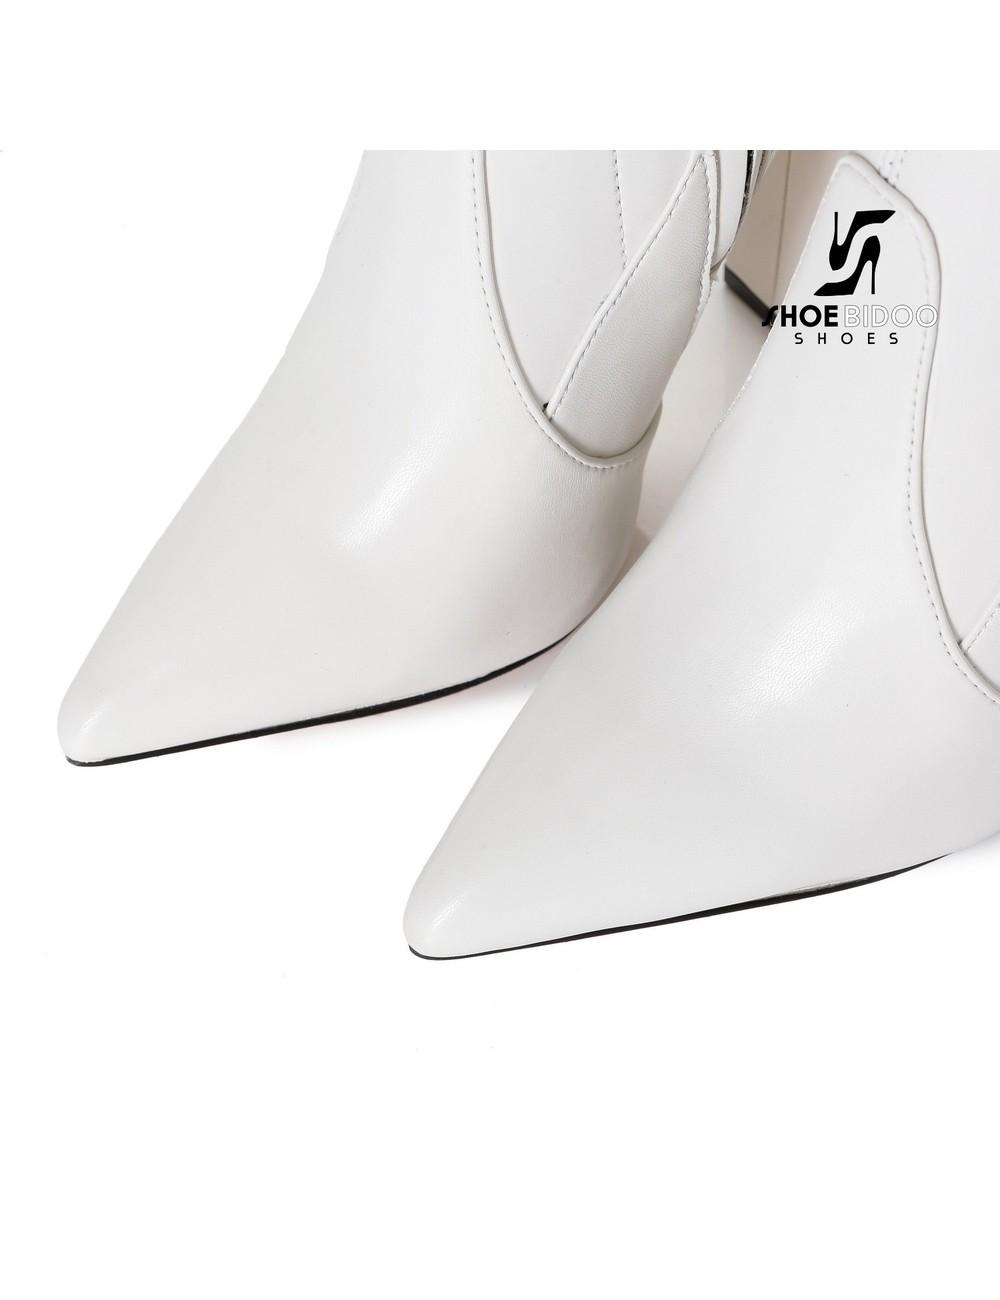 Giaro Giaro Oberschenkel Stiefel TRINKET in weiss Matte